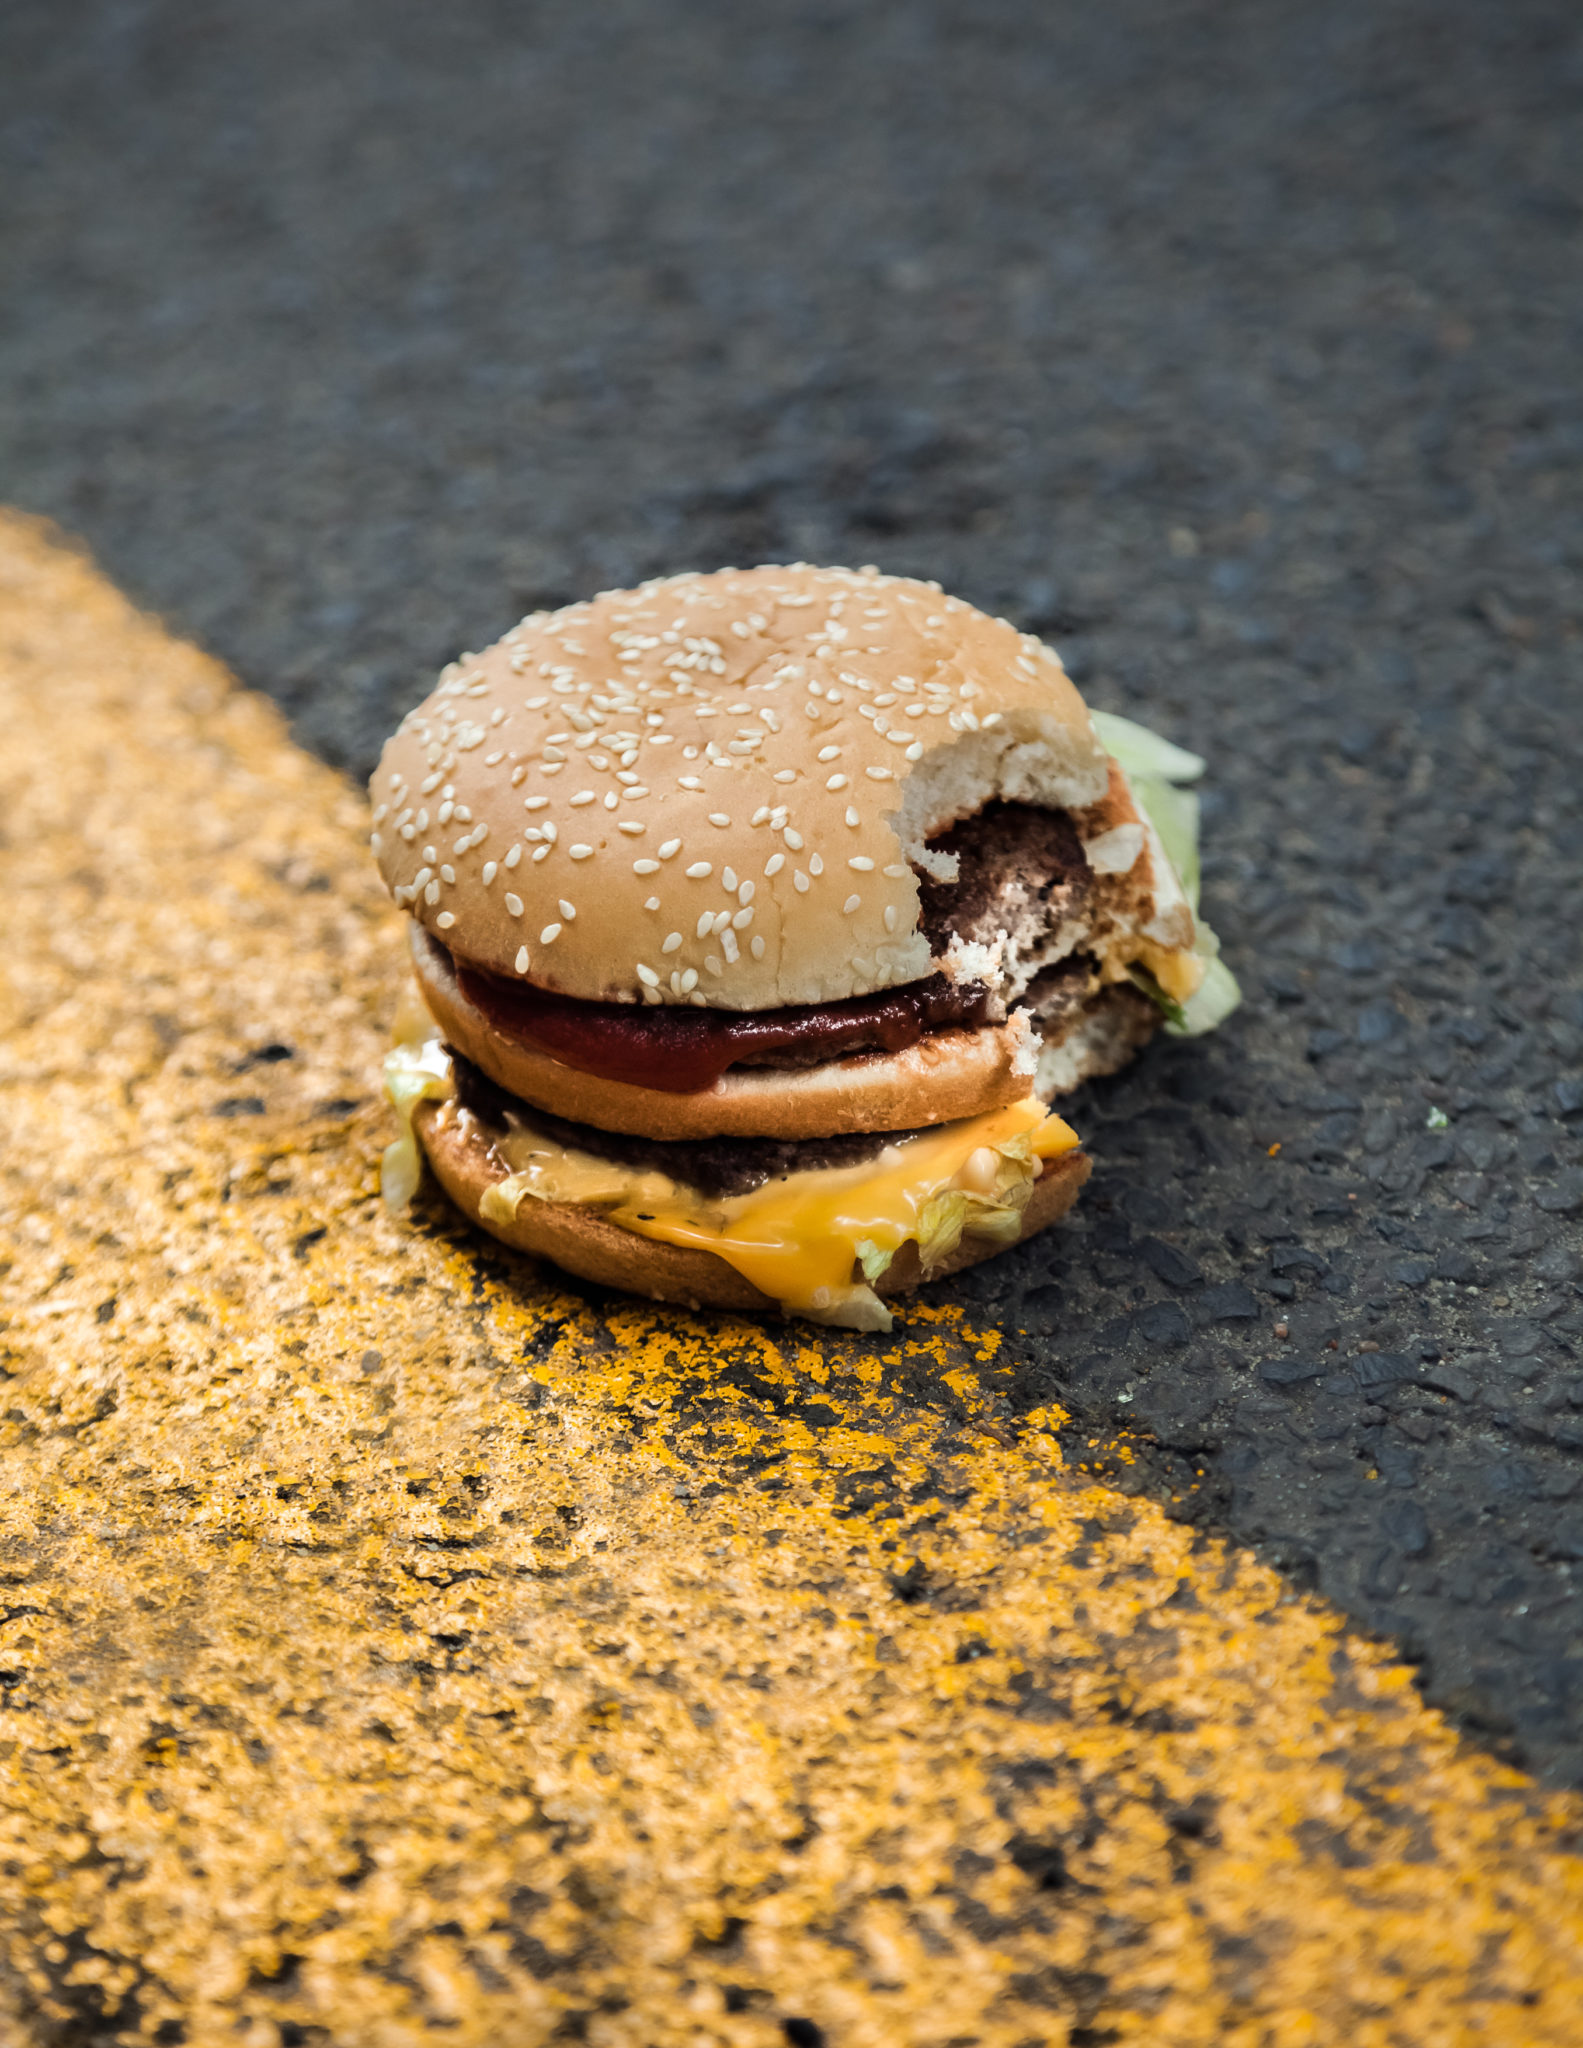 Nadgryziony hamburger leżący na jezdni